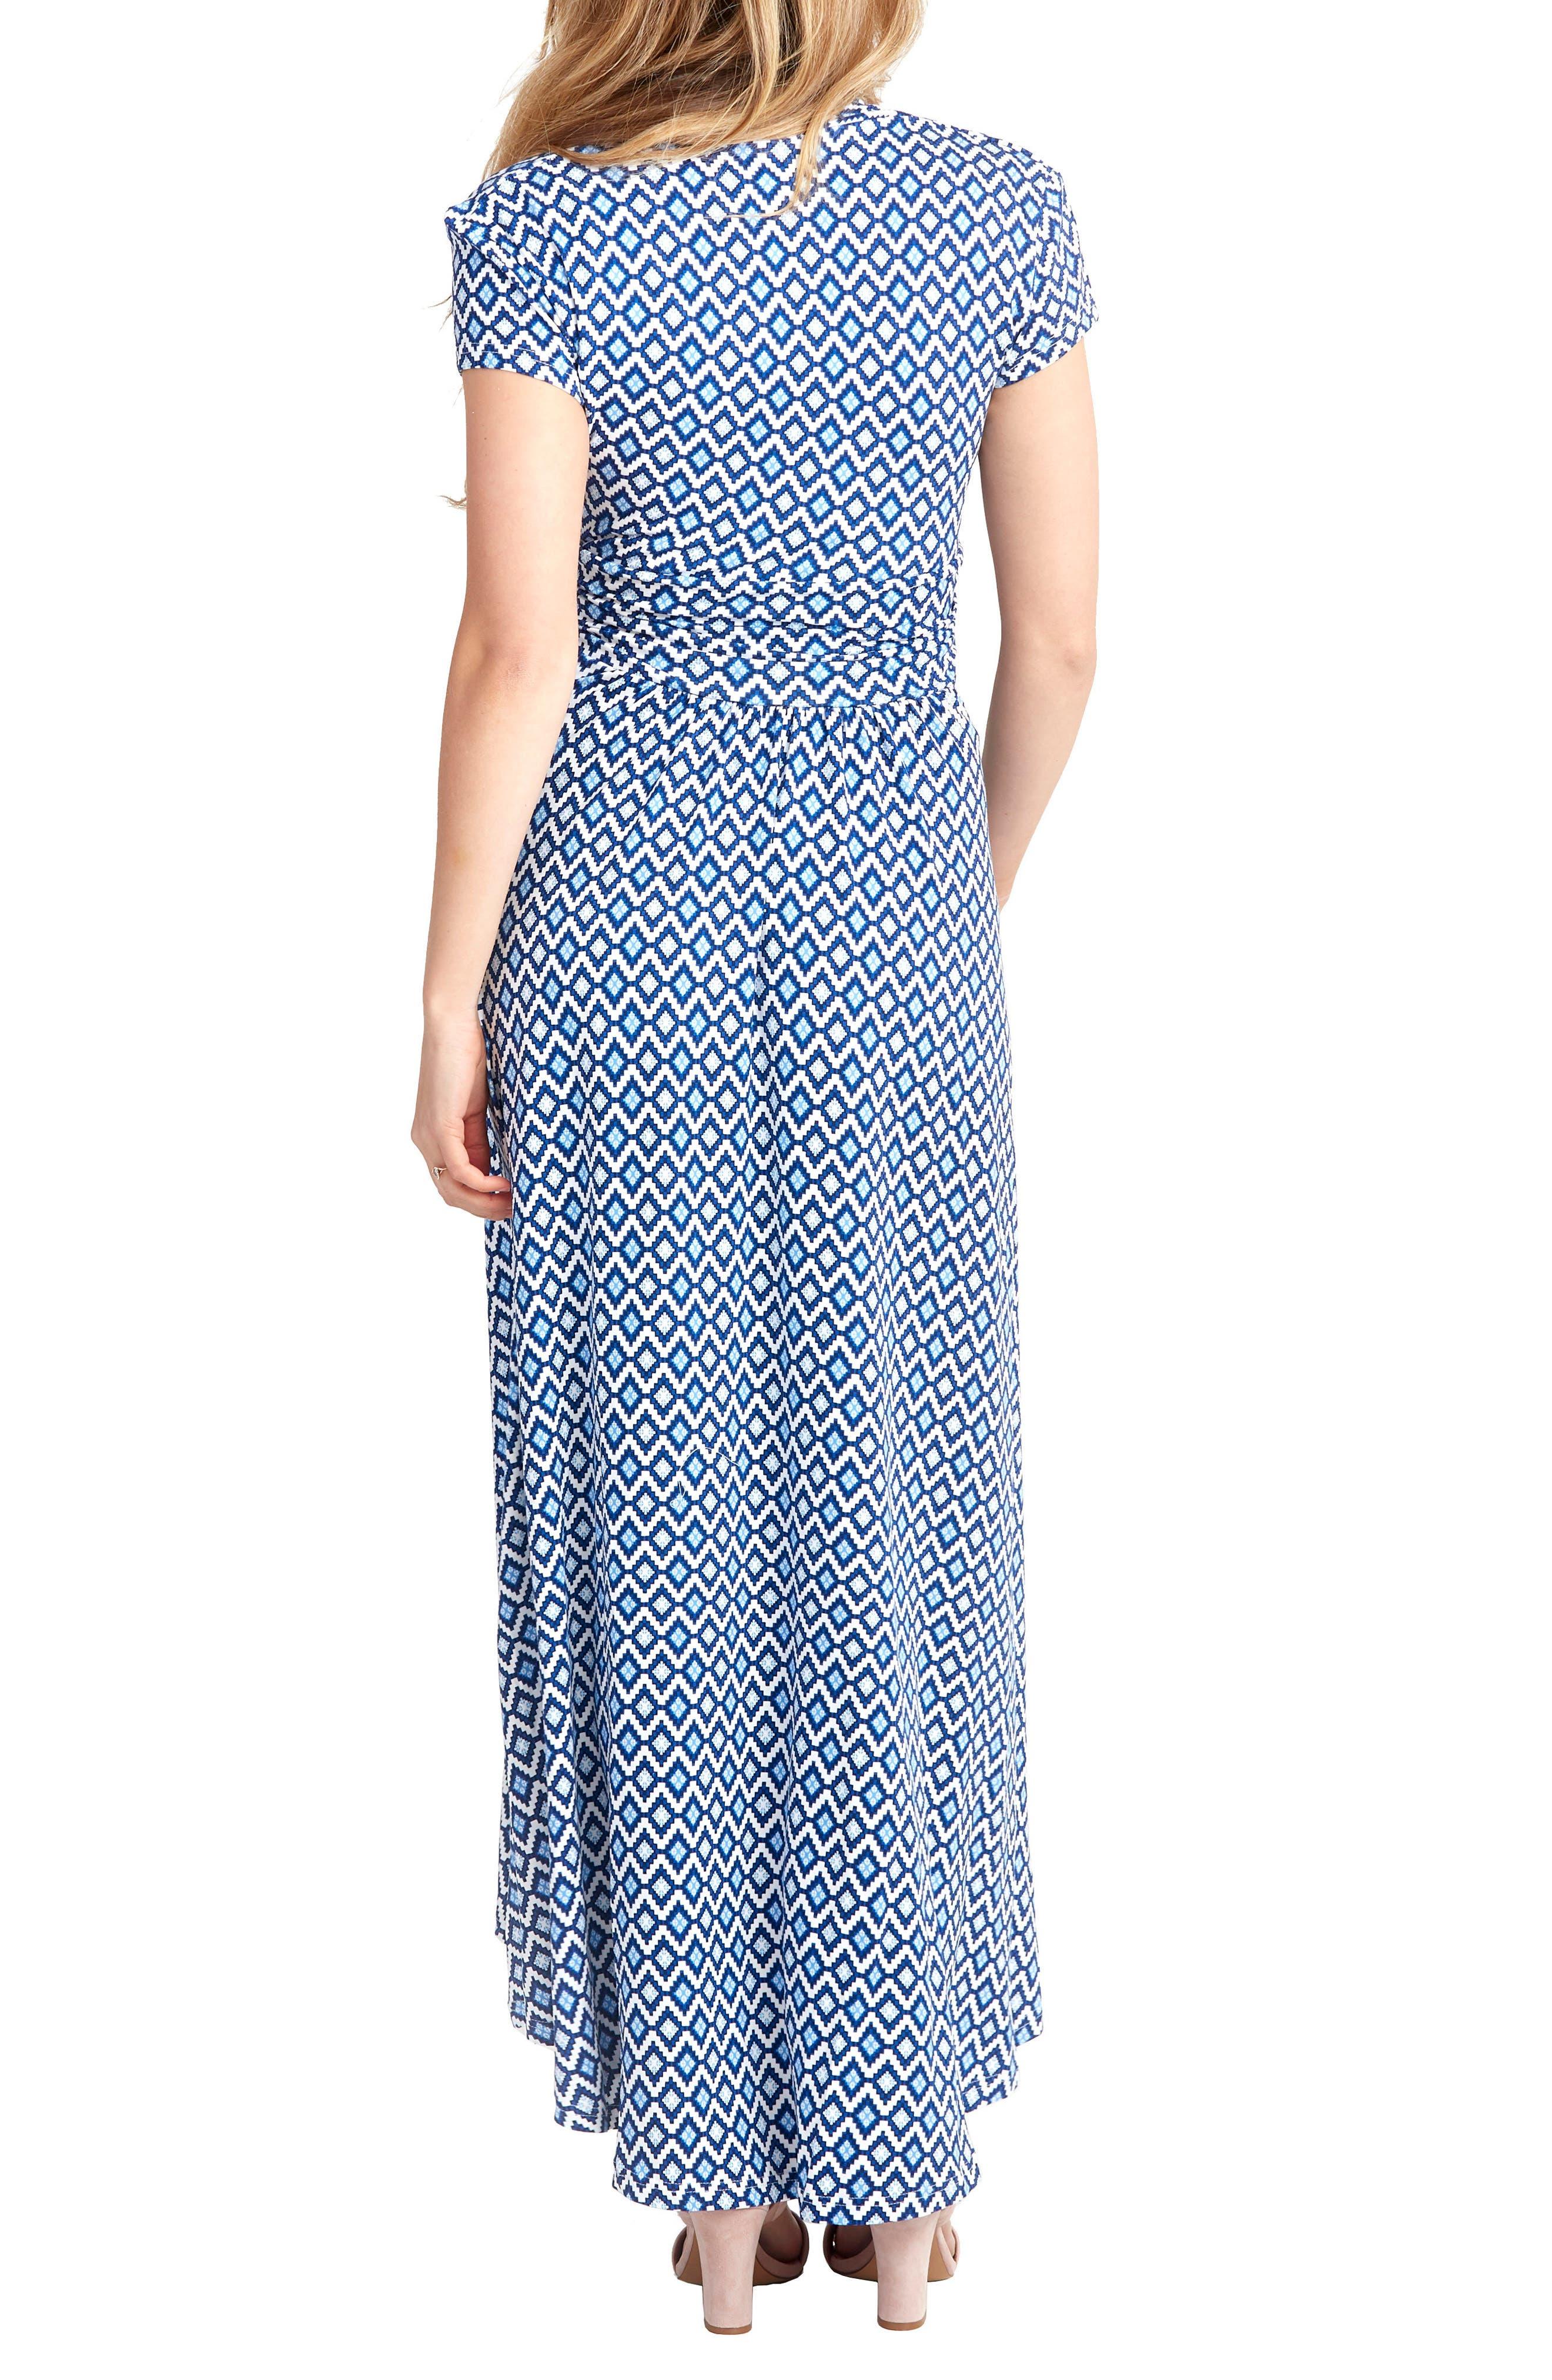 Alternate Image 2  - Nom Maternity 'Caroline' Maternity/Nursing Maxi Dress